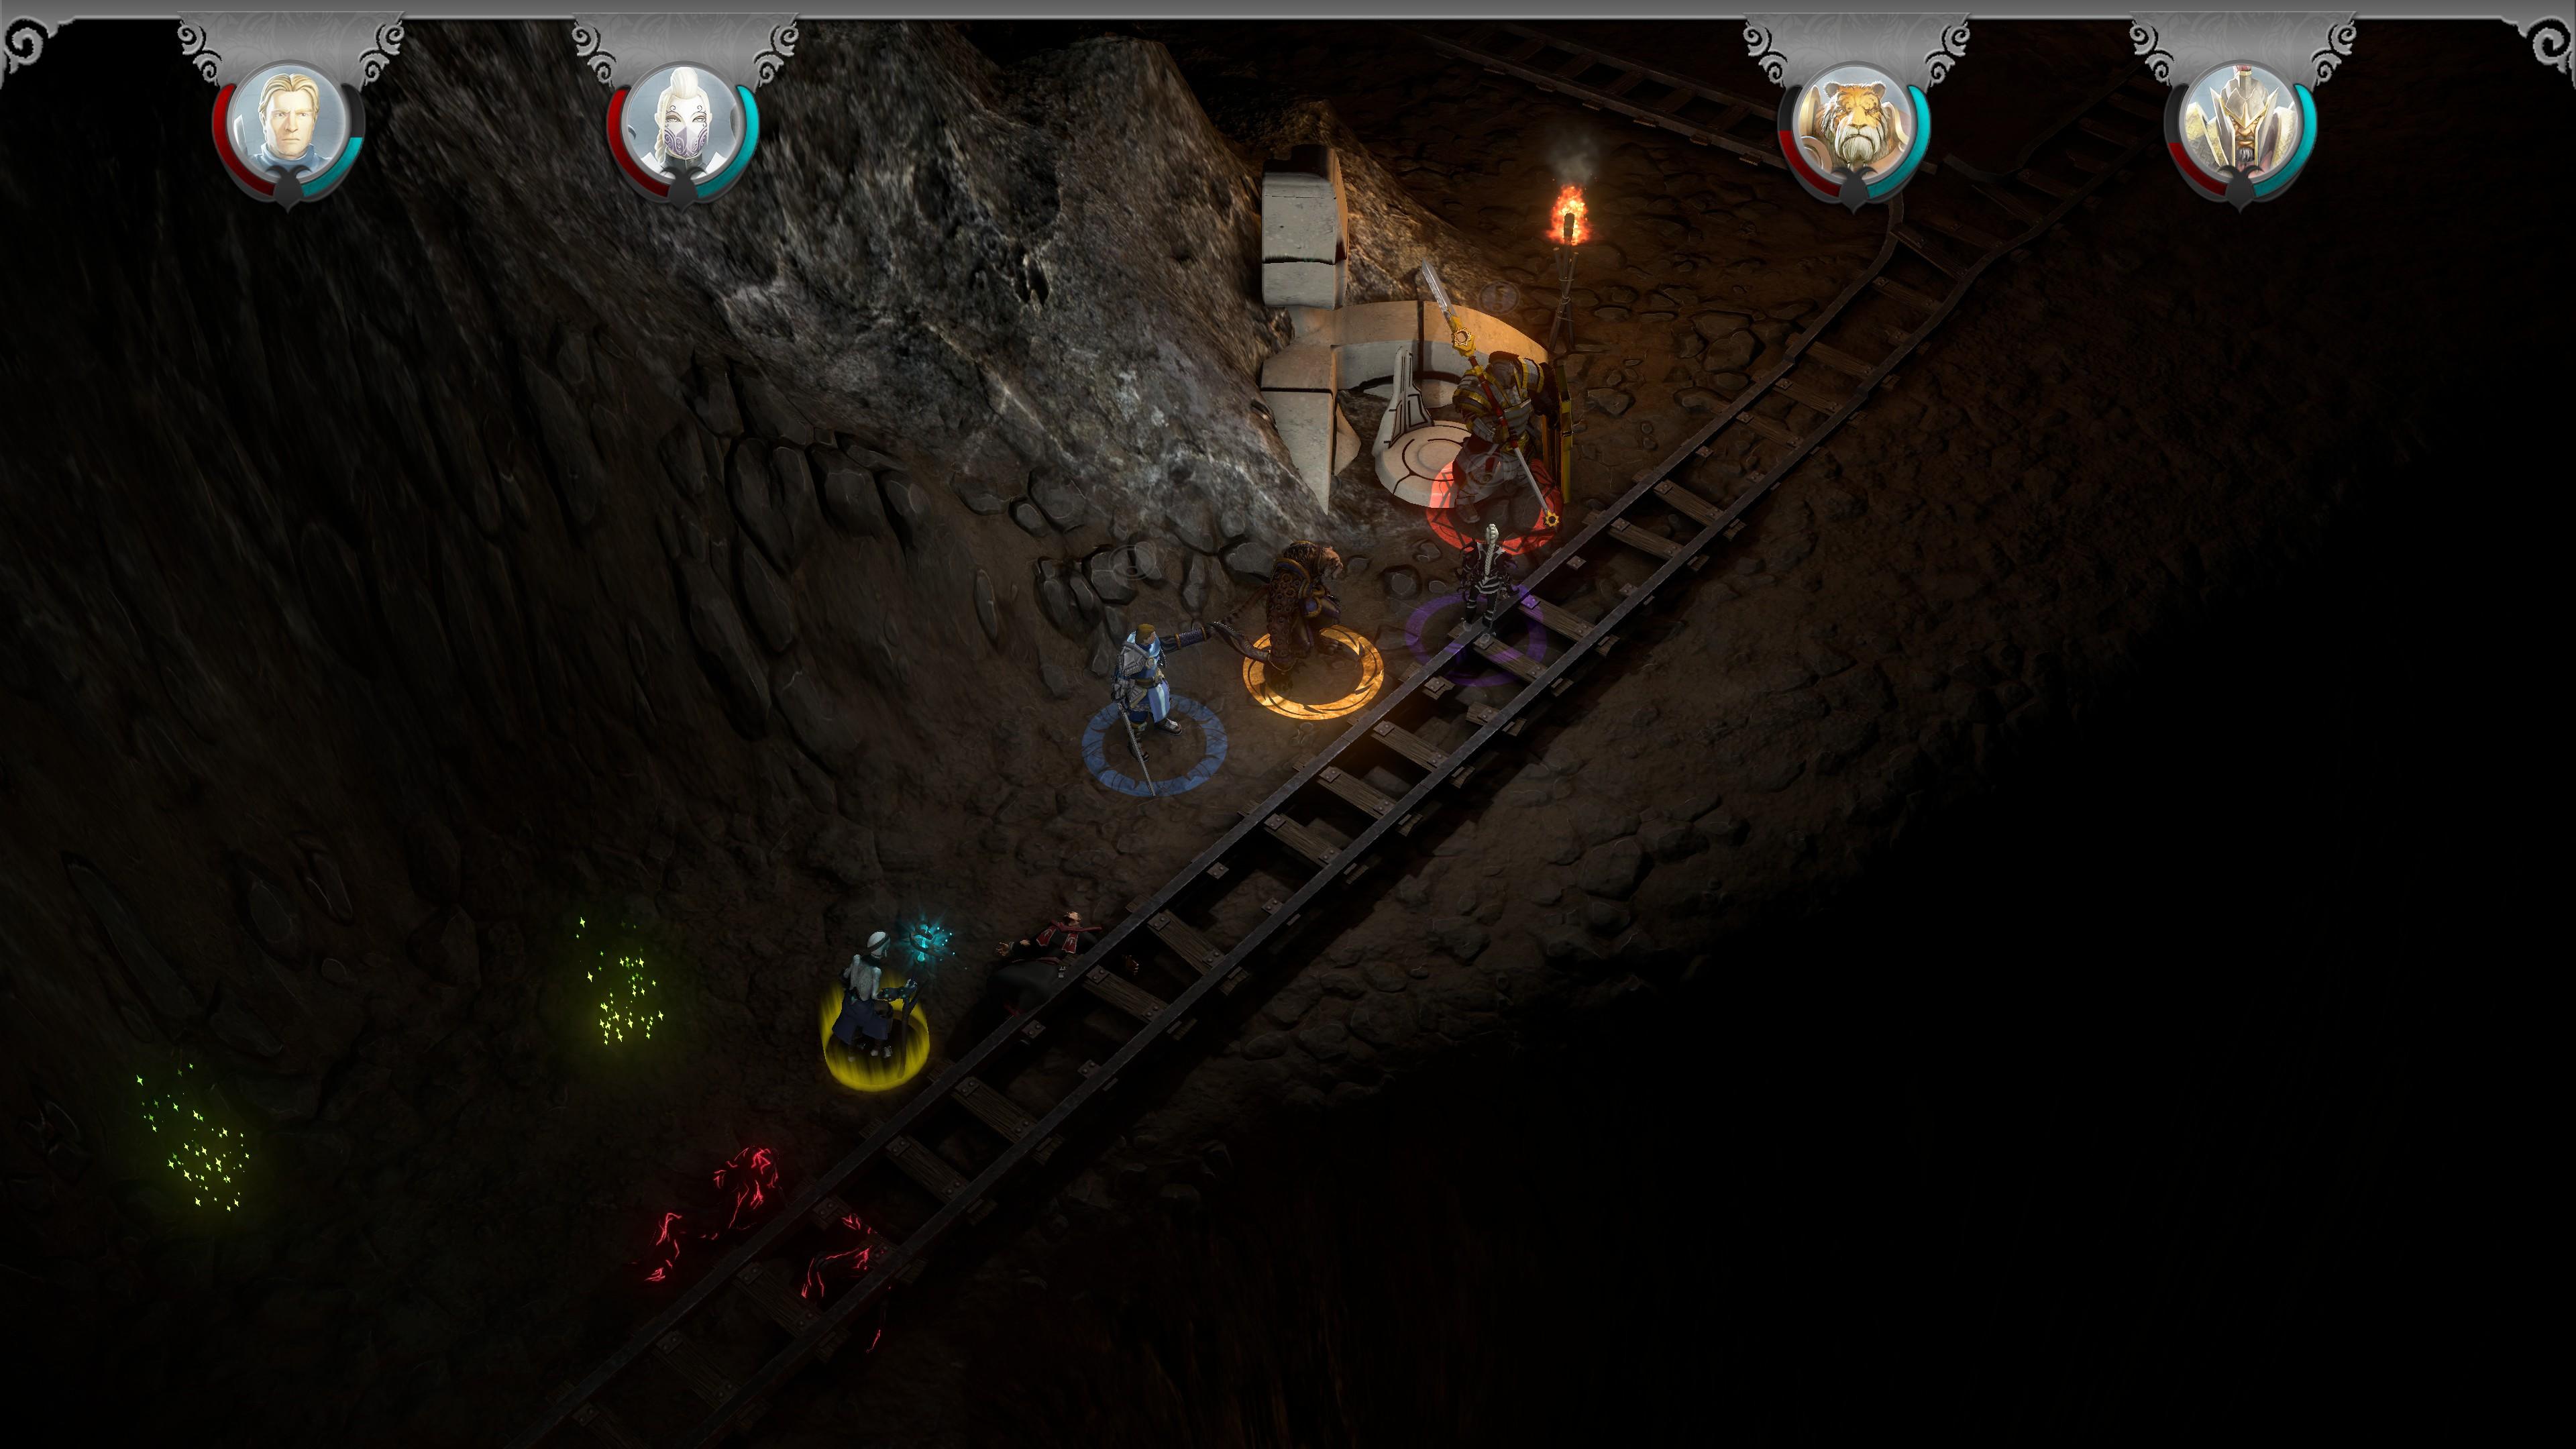 Eon Altar: Episode 3 - The Watcher in the Dark screenshot